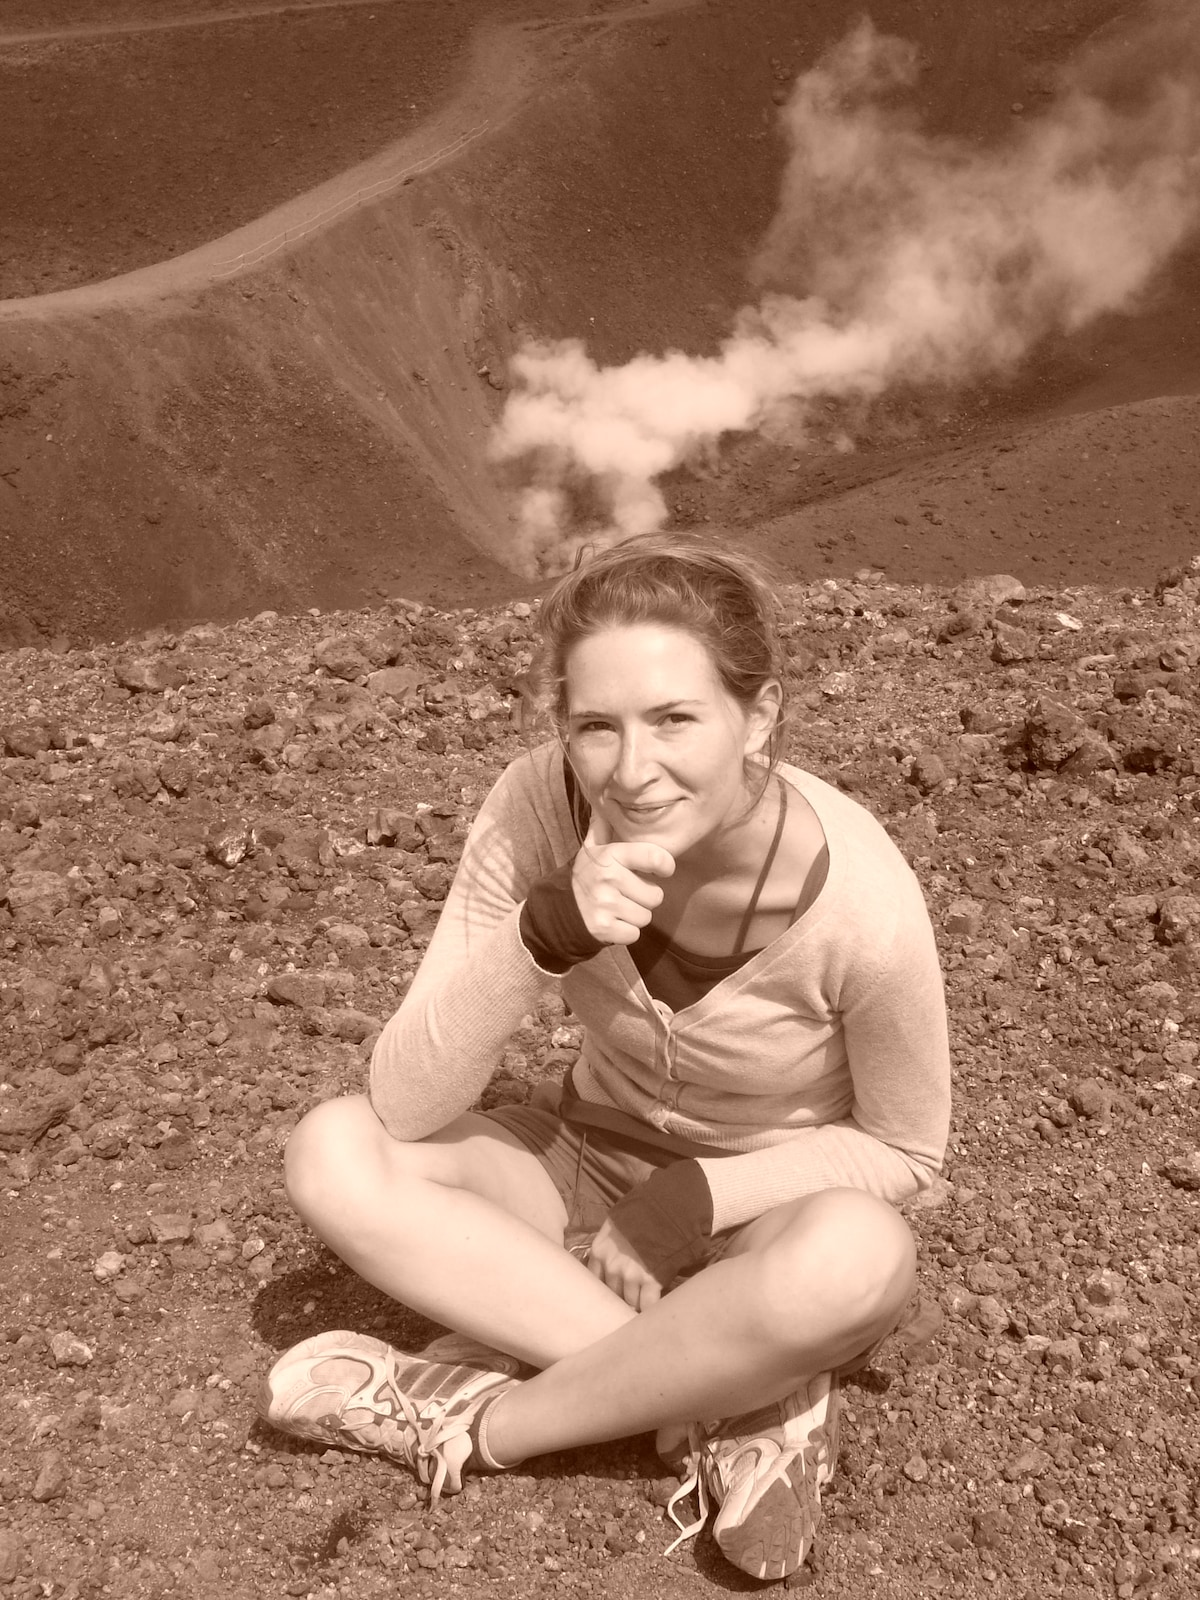 Marta From Tagounite, Morocco